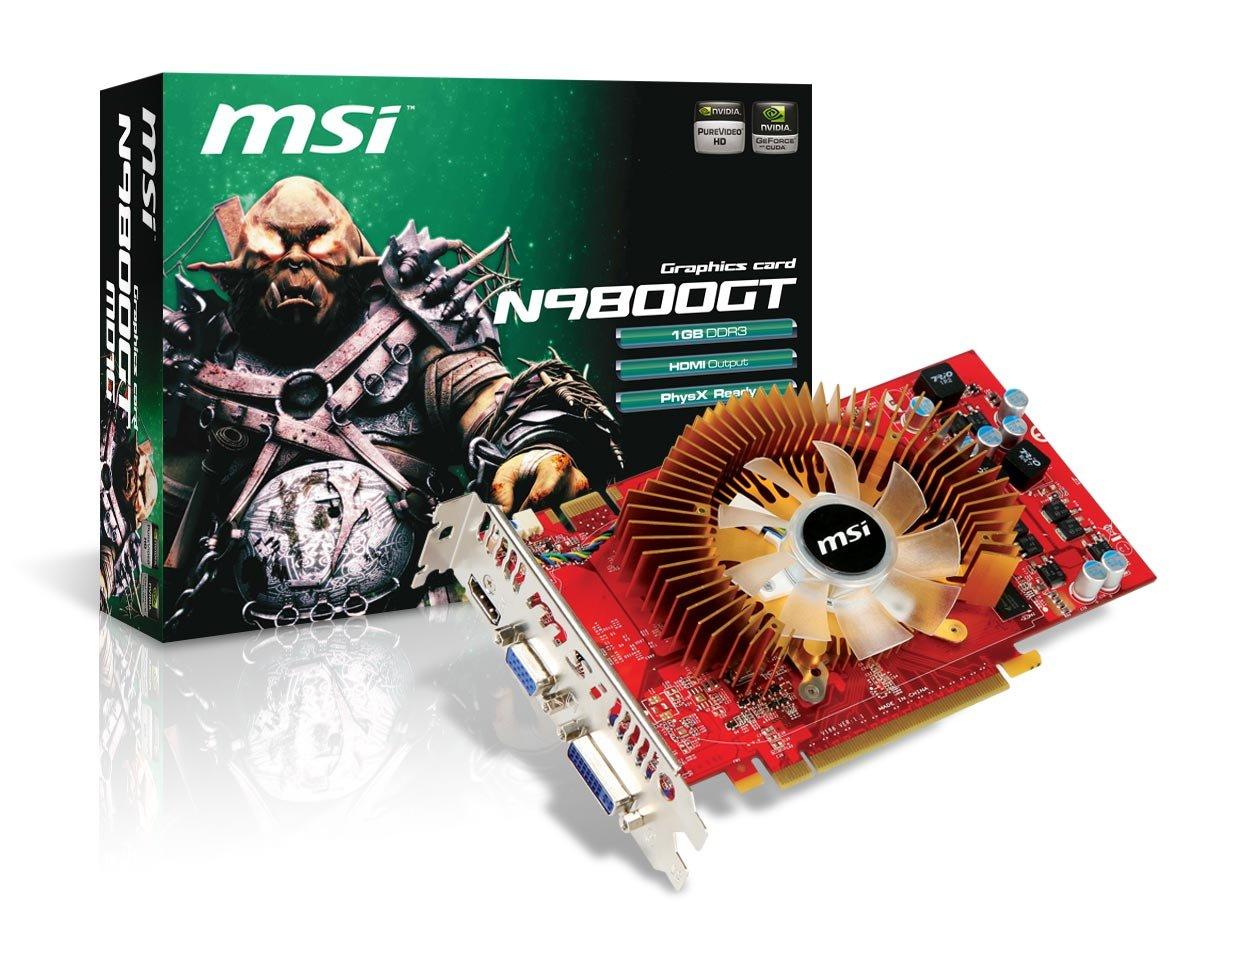 Nvidia n9800gt driver moodarchives.